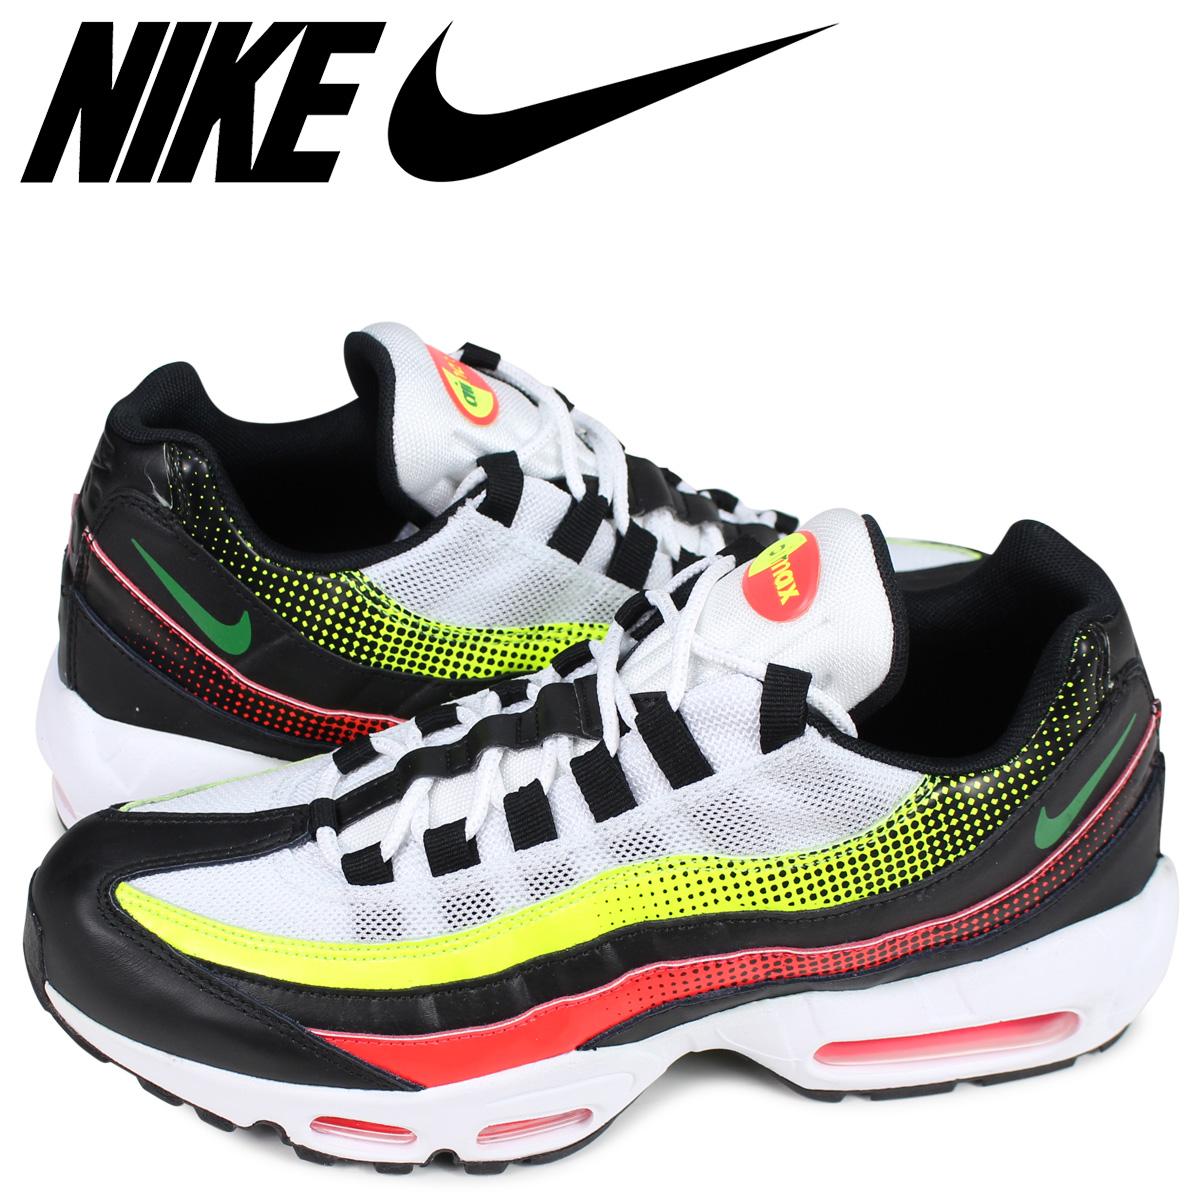 best cheap 74fd3 1eb85 NIKE AIR MAX 95 SE Kie Ney AMAX 95 sneakers men black black AJ2018-004  4 19  Shinnyu load